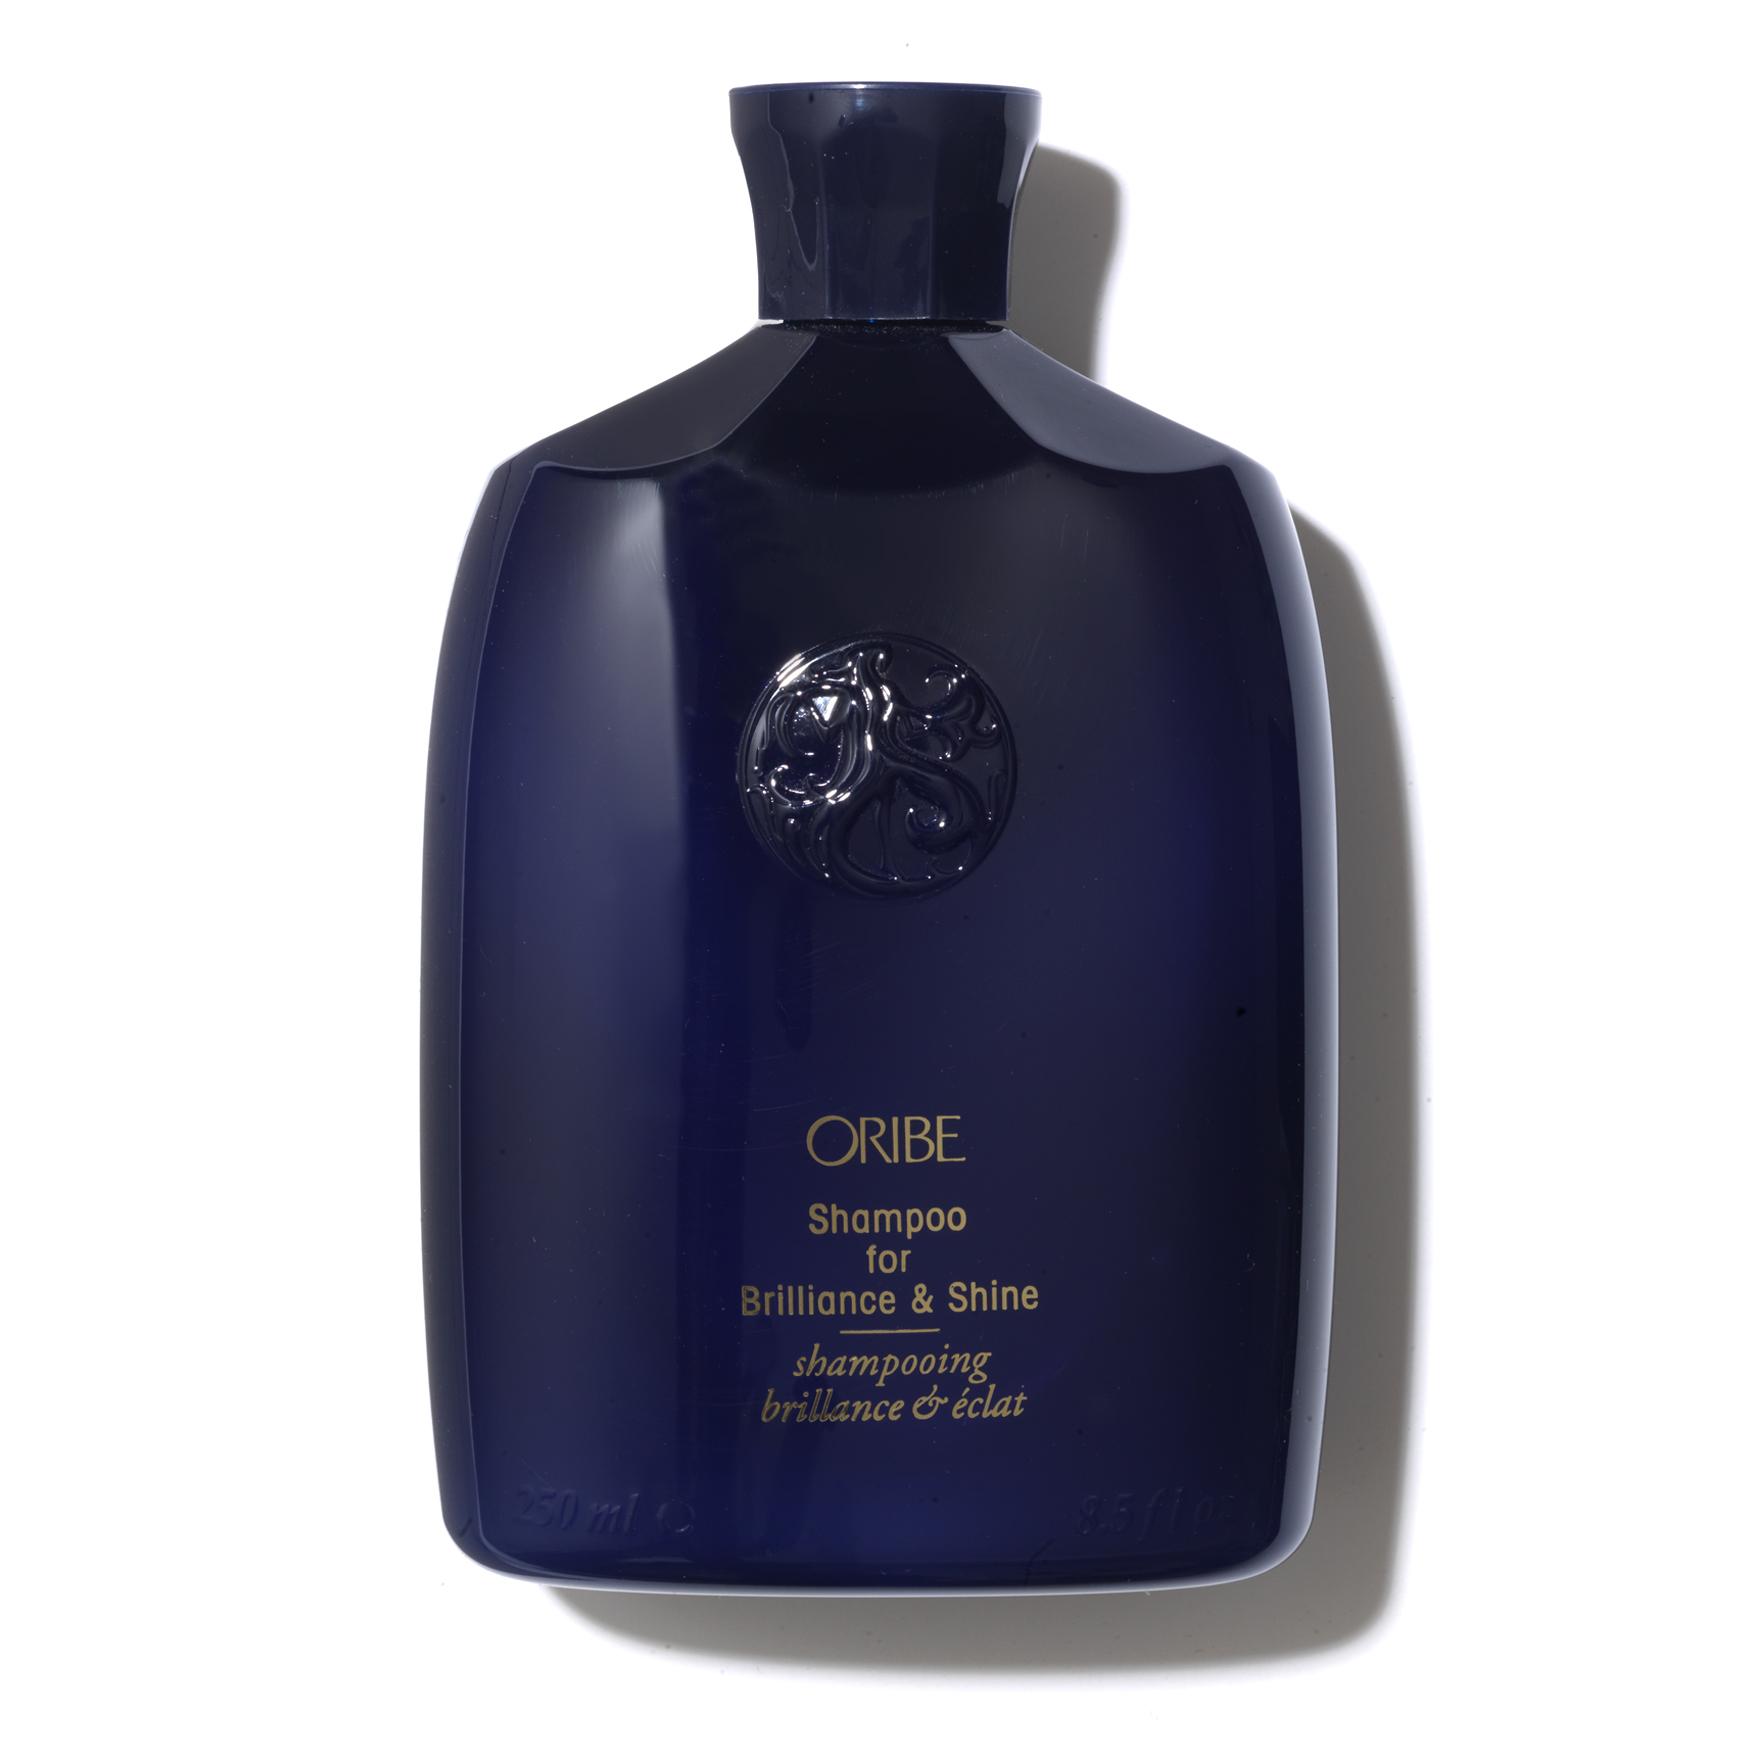 Shampoo Brilliance and Shine, , large